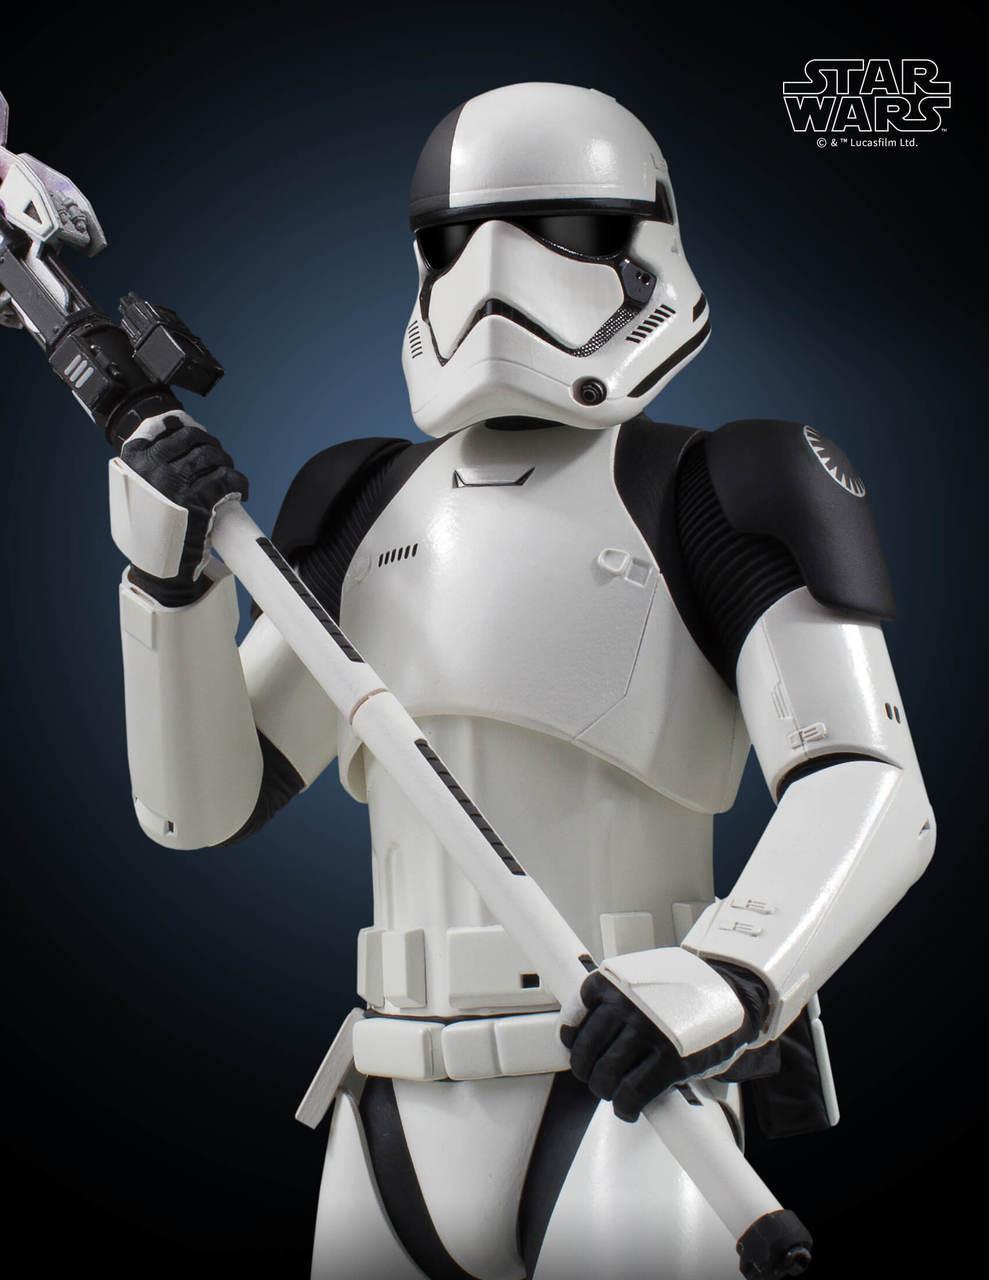 Gentle Giant Executioner Trooper Statue 6